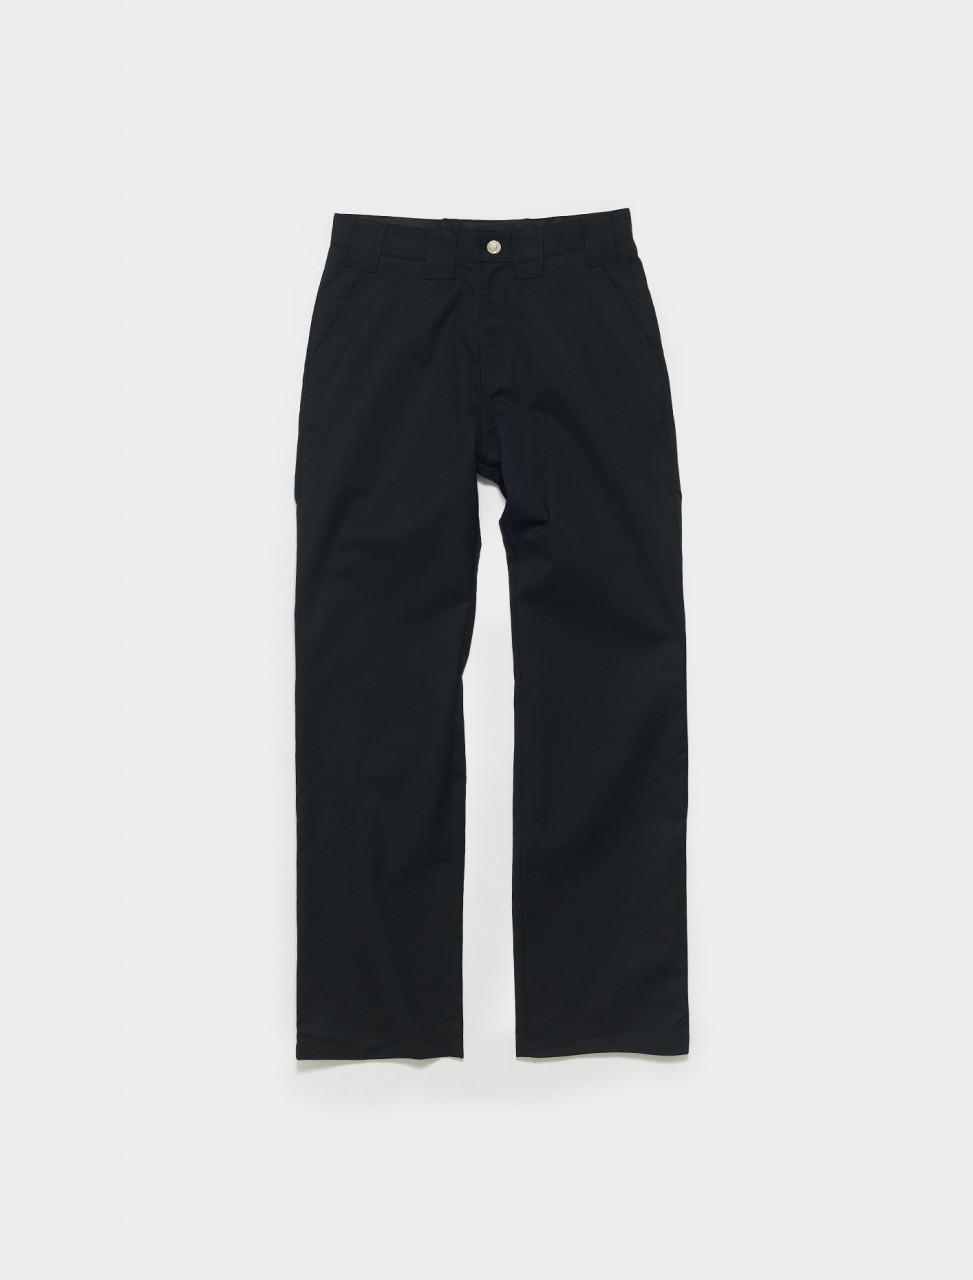 SS21TR08-Black AFFIX DUTY PANTS IN BLACK